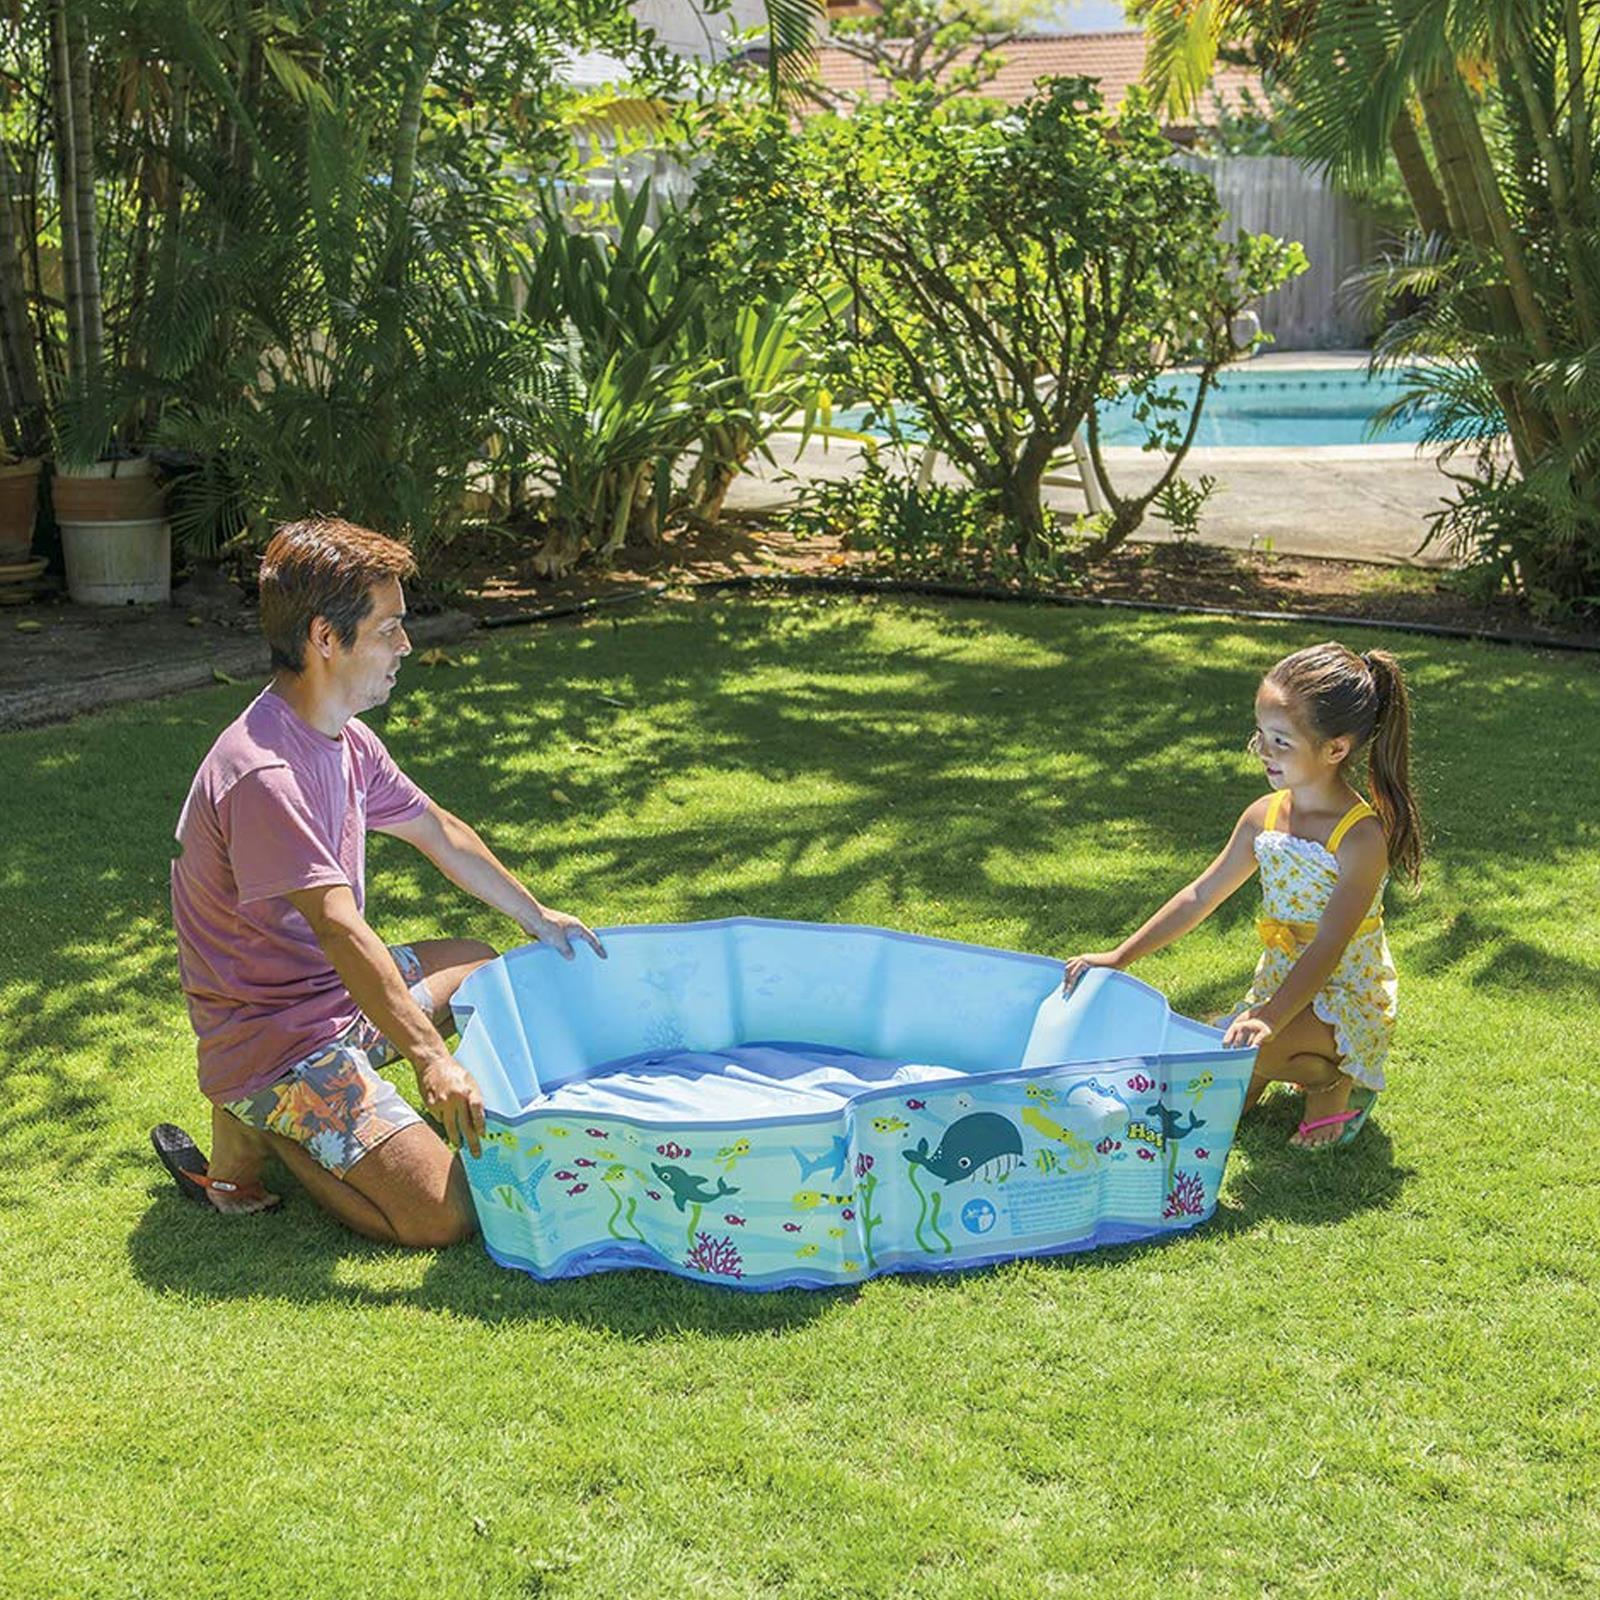 Centro-De-Juegos-De-Natacion-Ninos-Ridgid-Pared-piscina-infantil-Mar-Vida-al-Aire-Libre-diversion miniatura 8